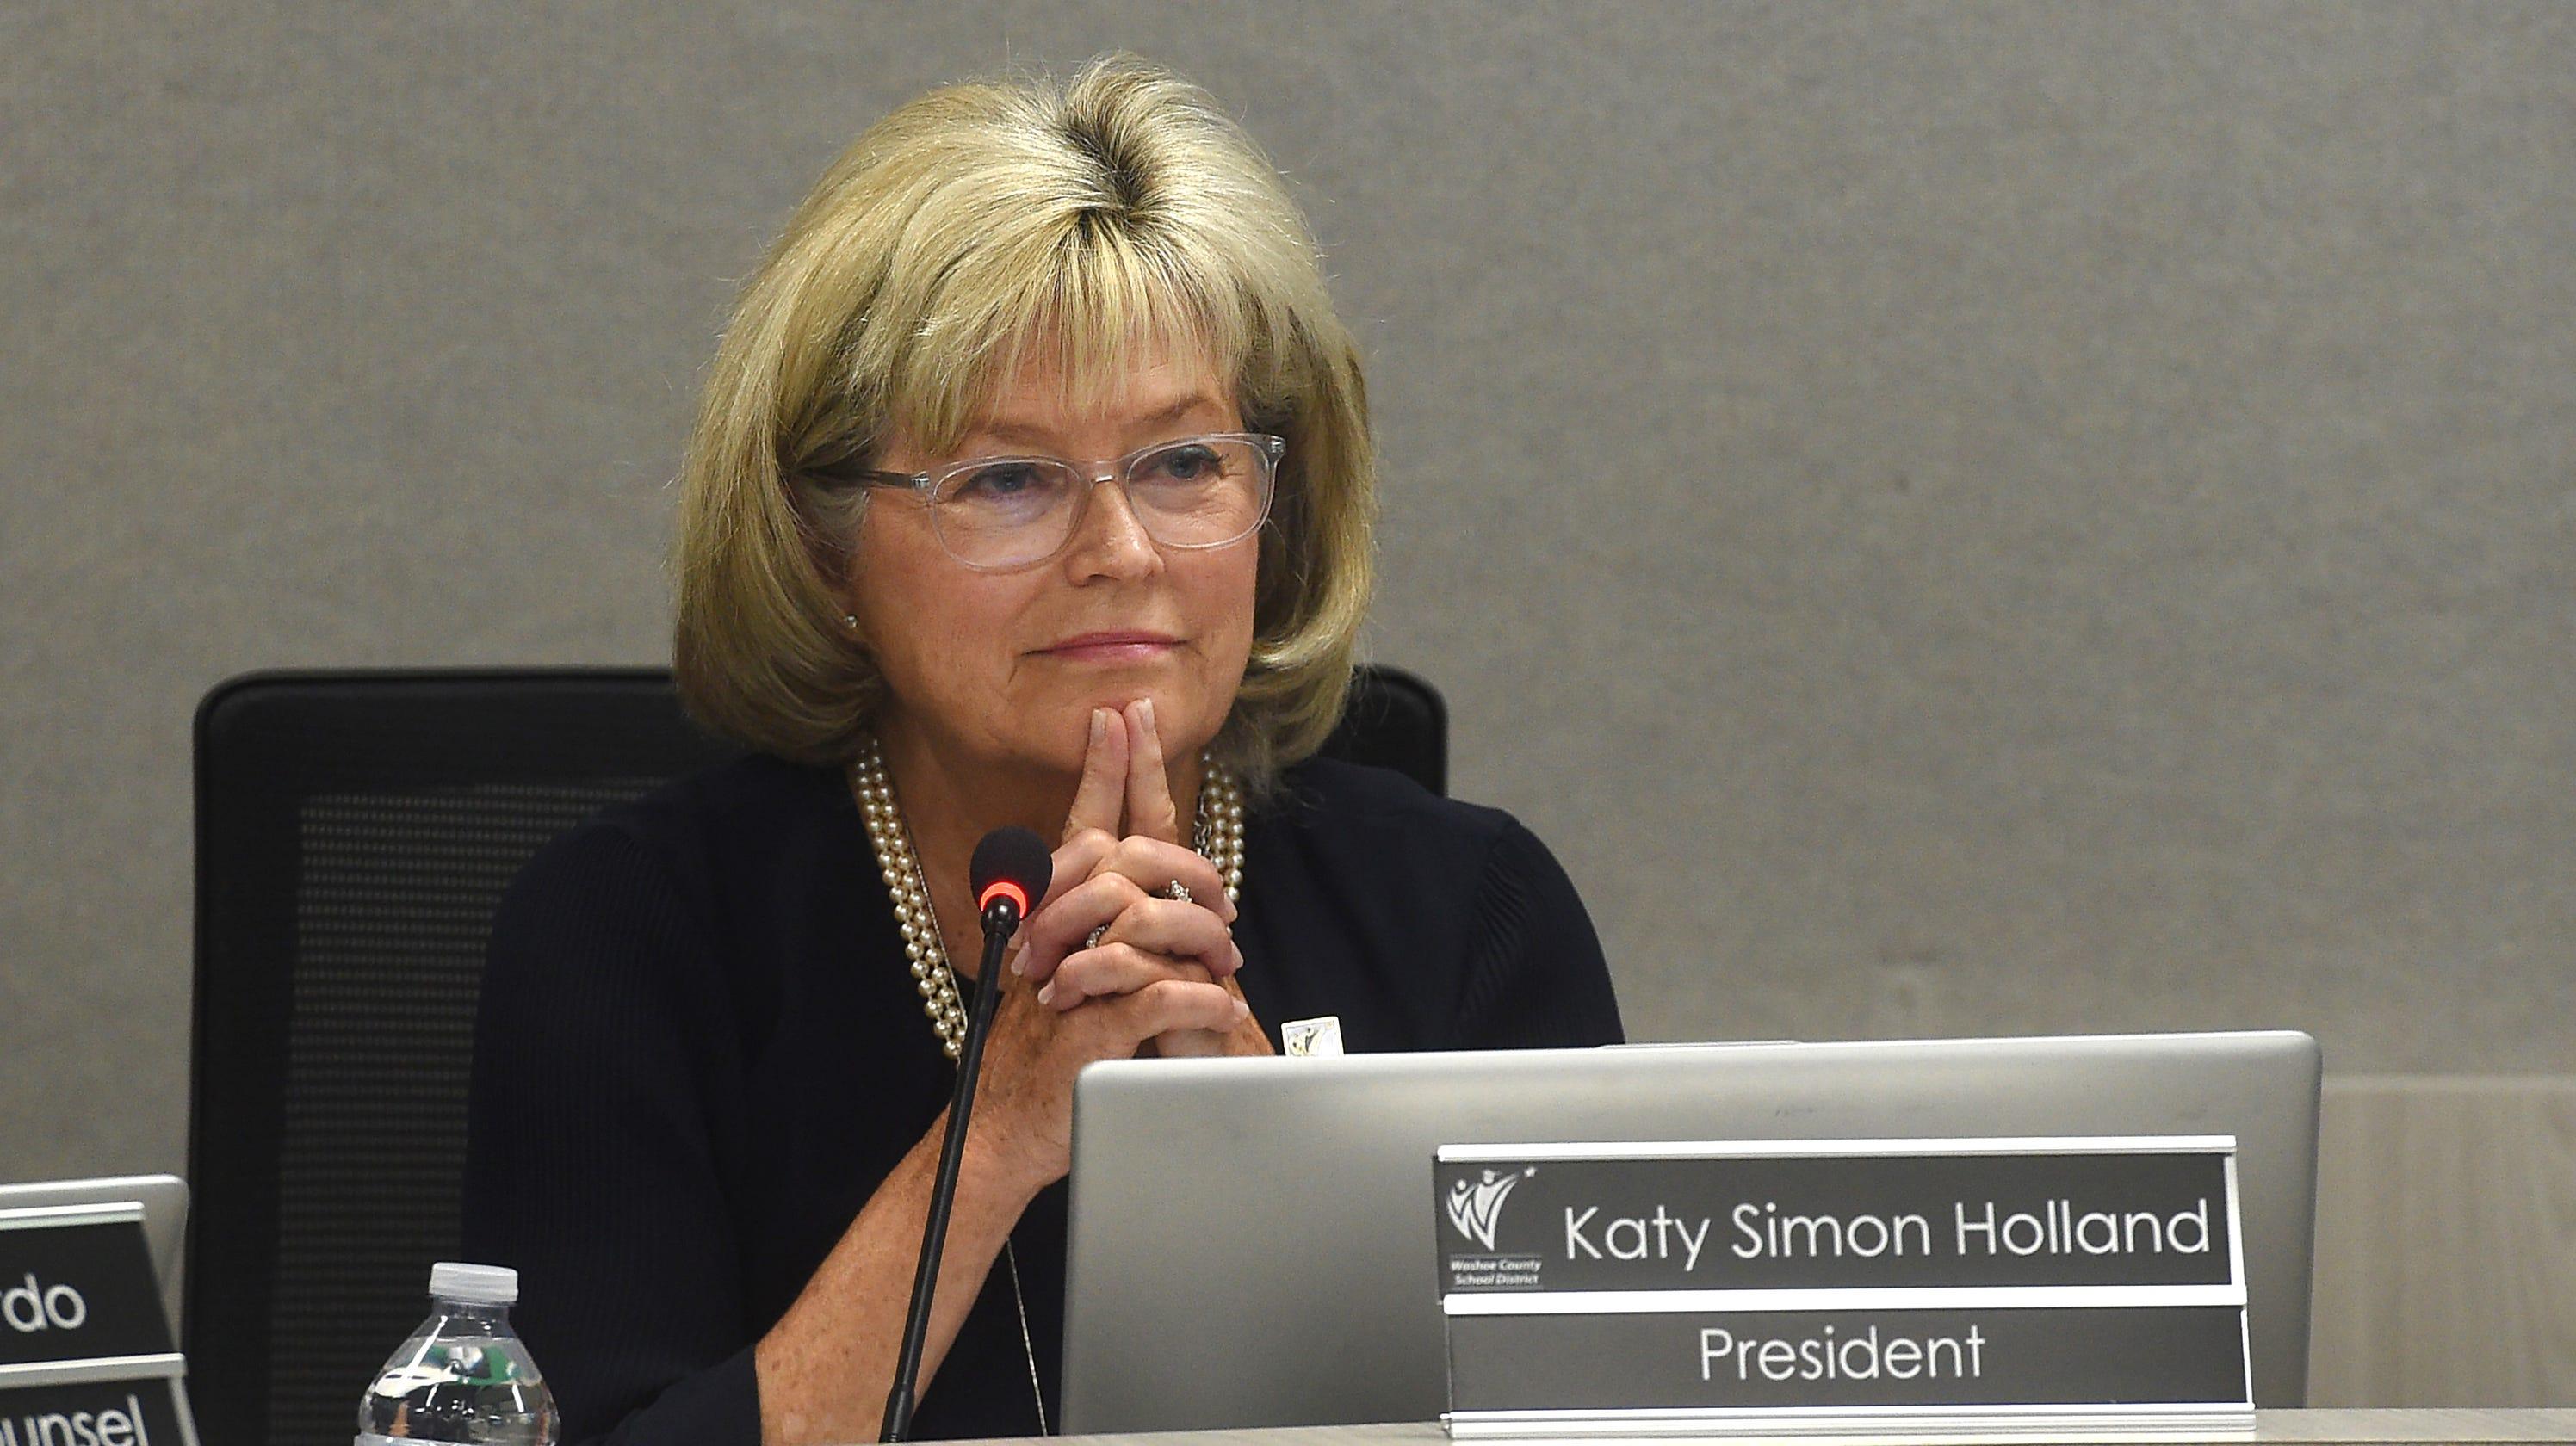 Katy Simon Holland and Malena Raymond won't run for re-election on WCSD board